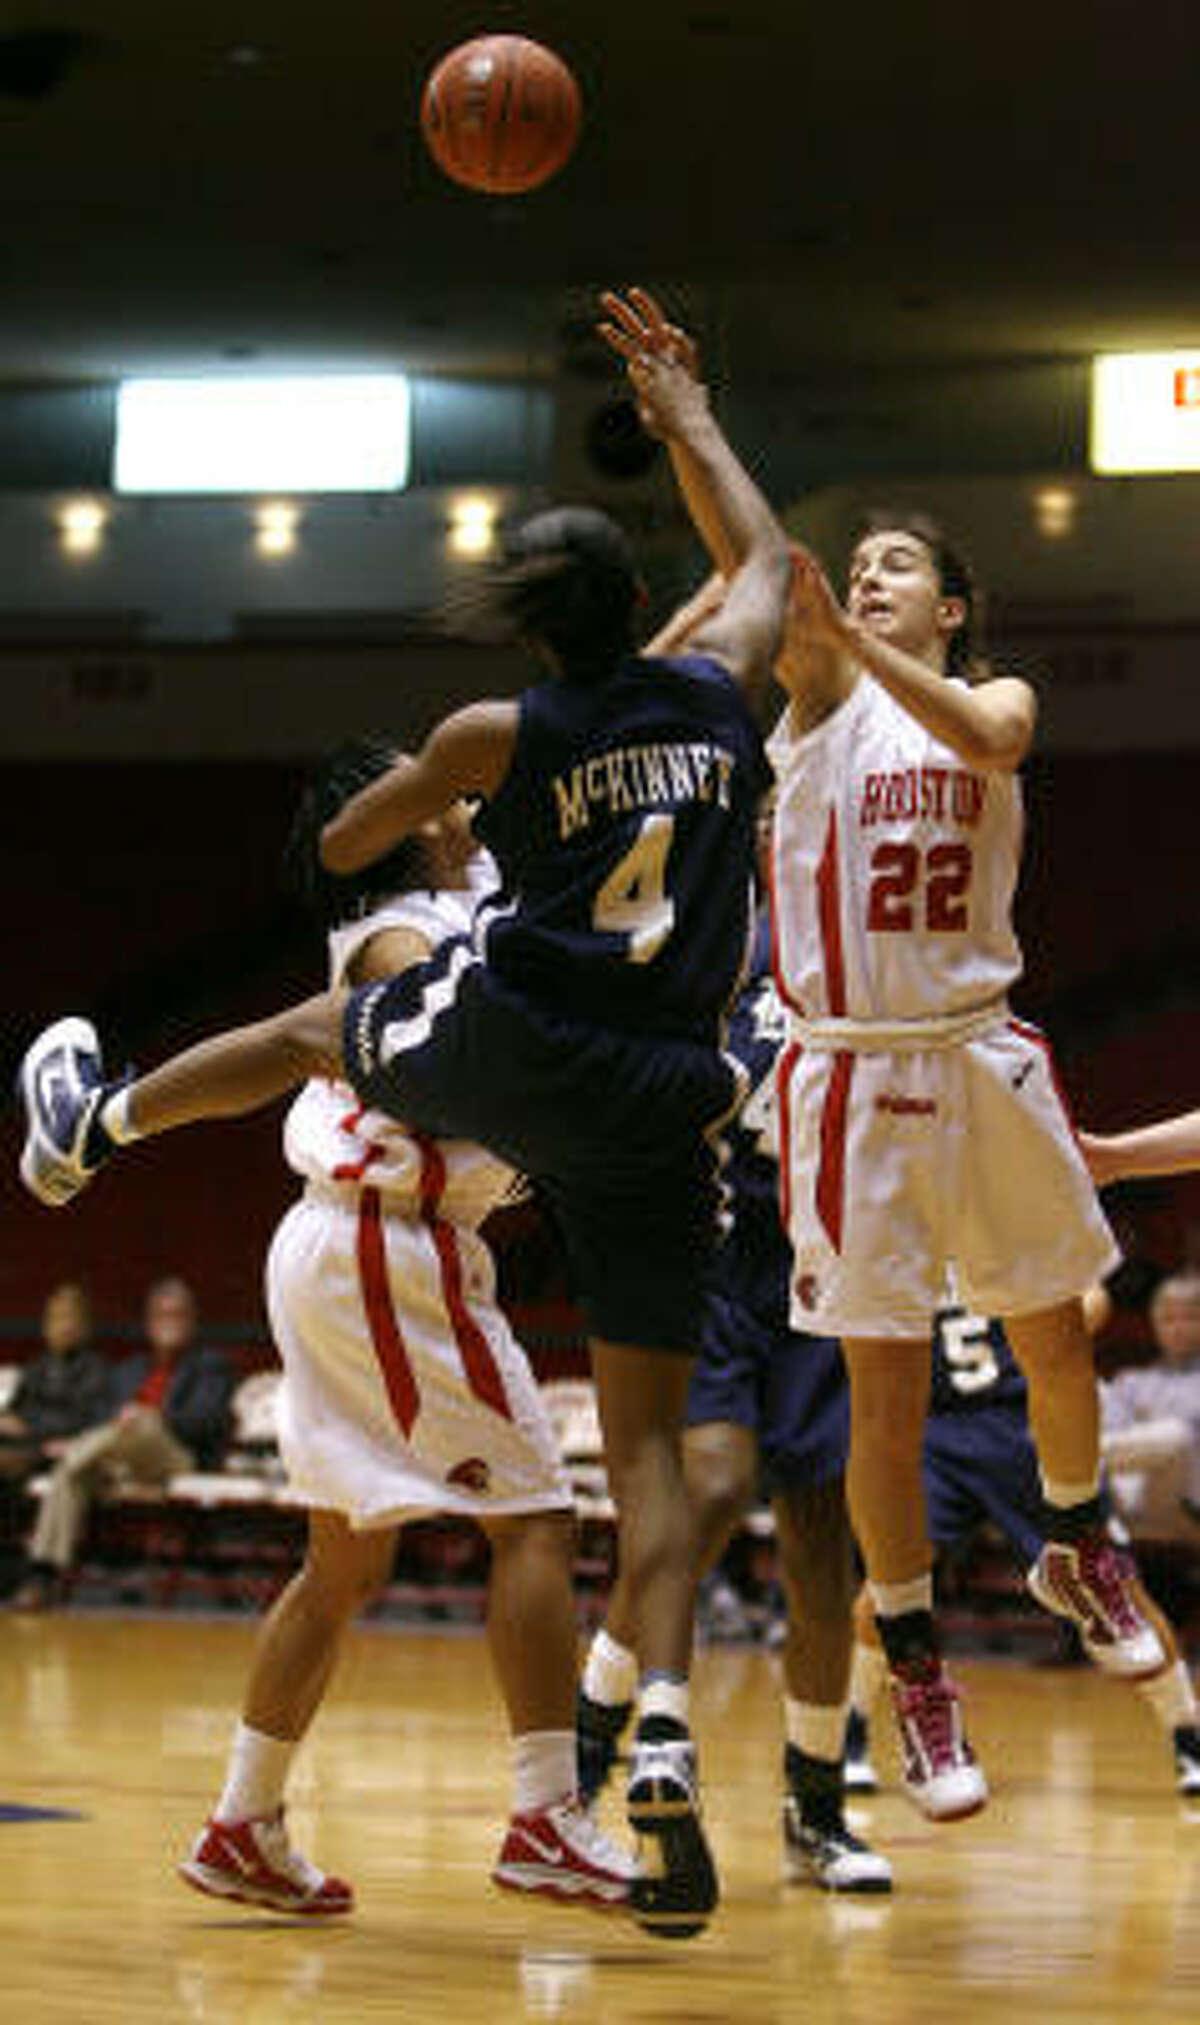 Houston's Roxana Button and Rice's Amenemope McKinney go up for a rebound.